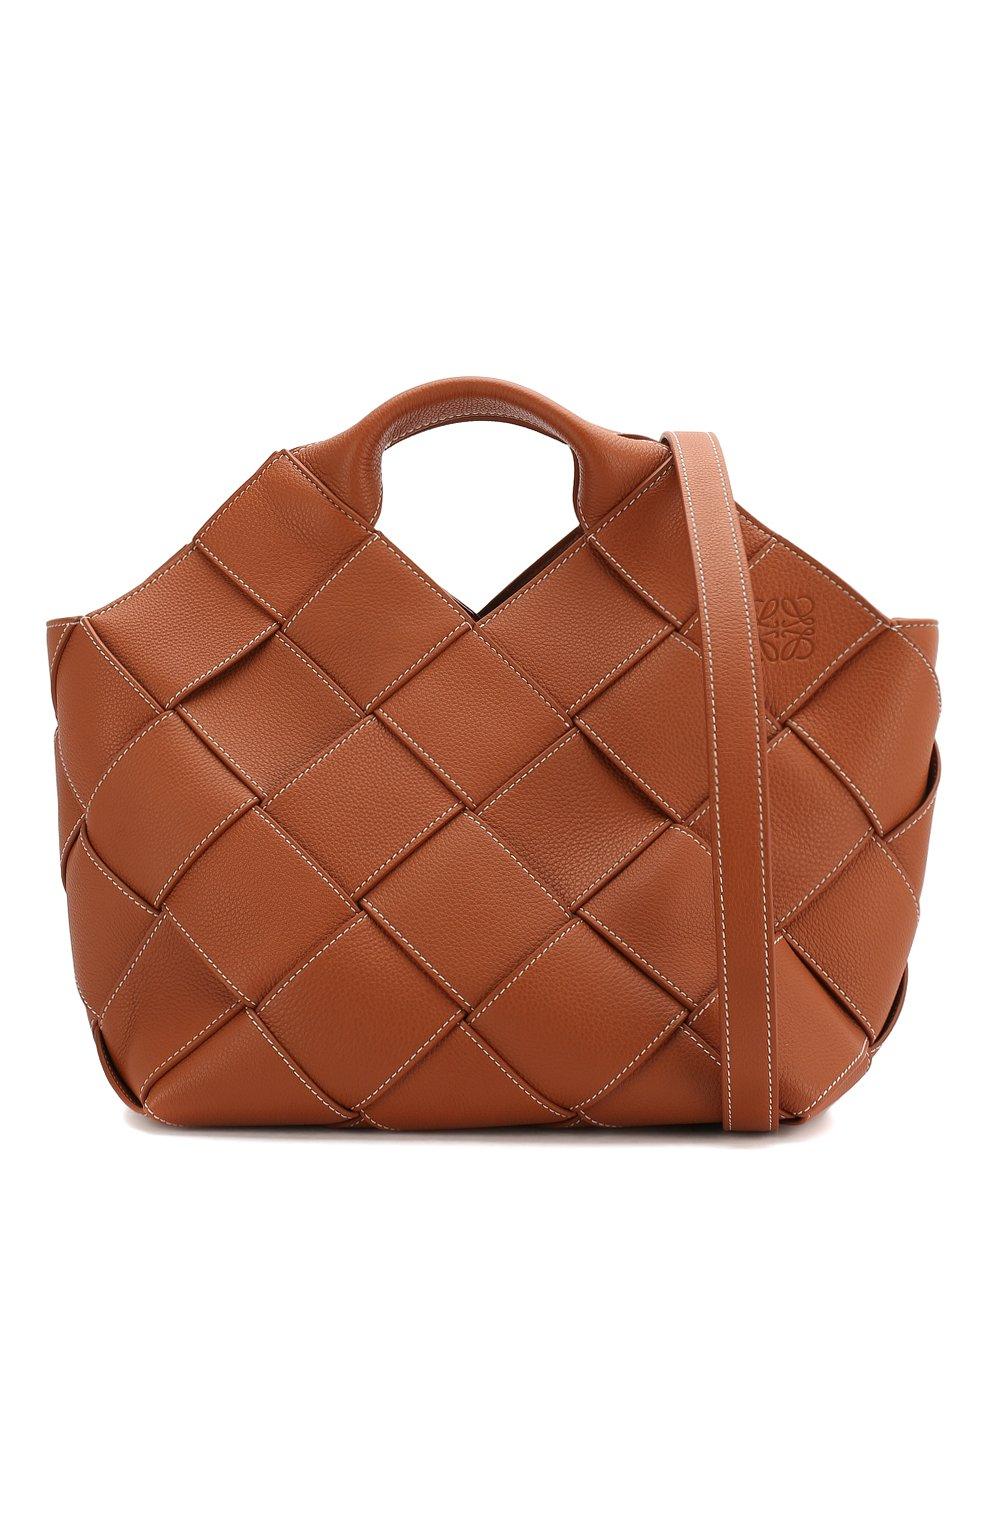 Женская сумка woven LOEWE светло-коричневого цвета, арт. 321.12.L62 | Фото 6